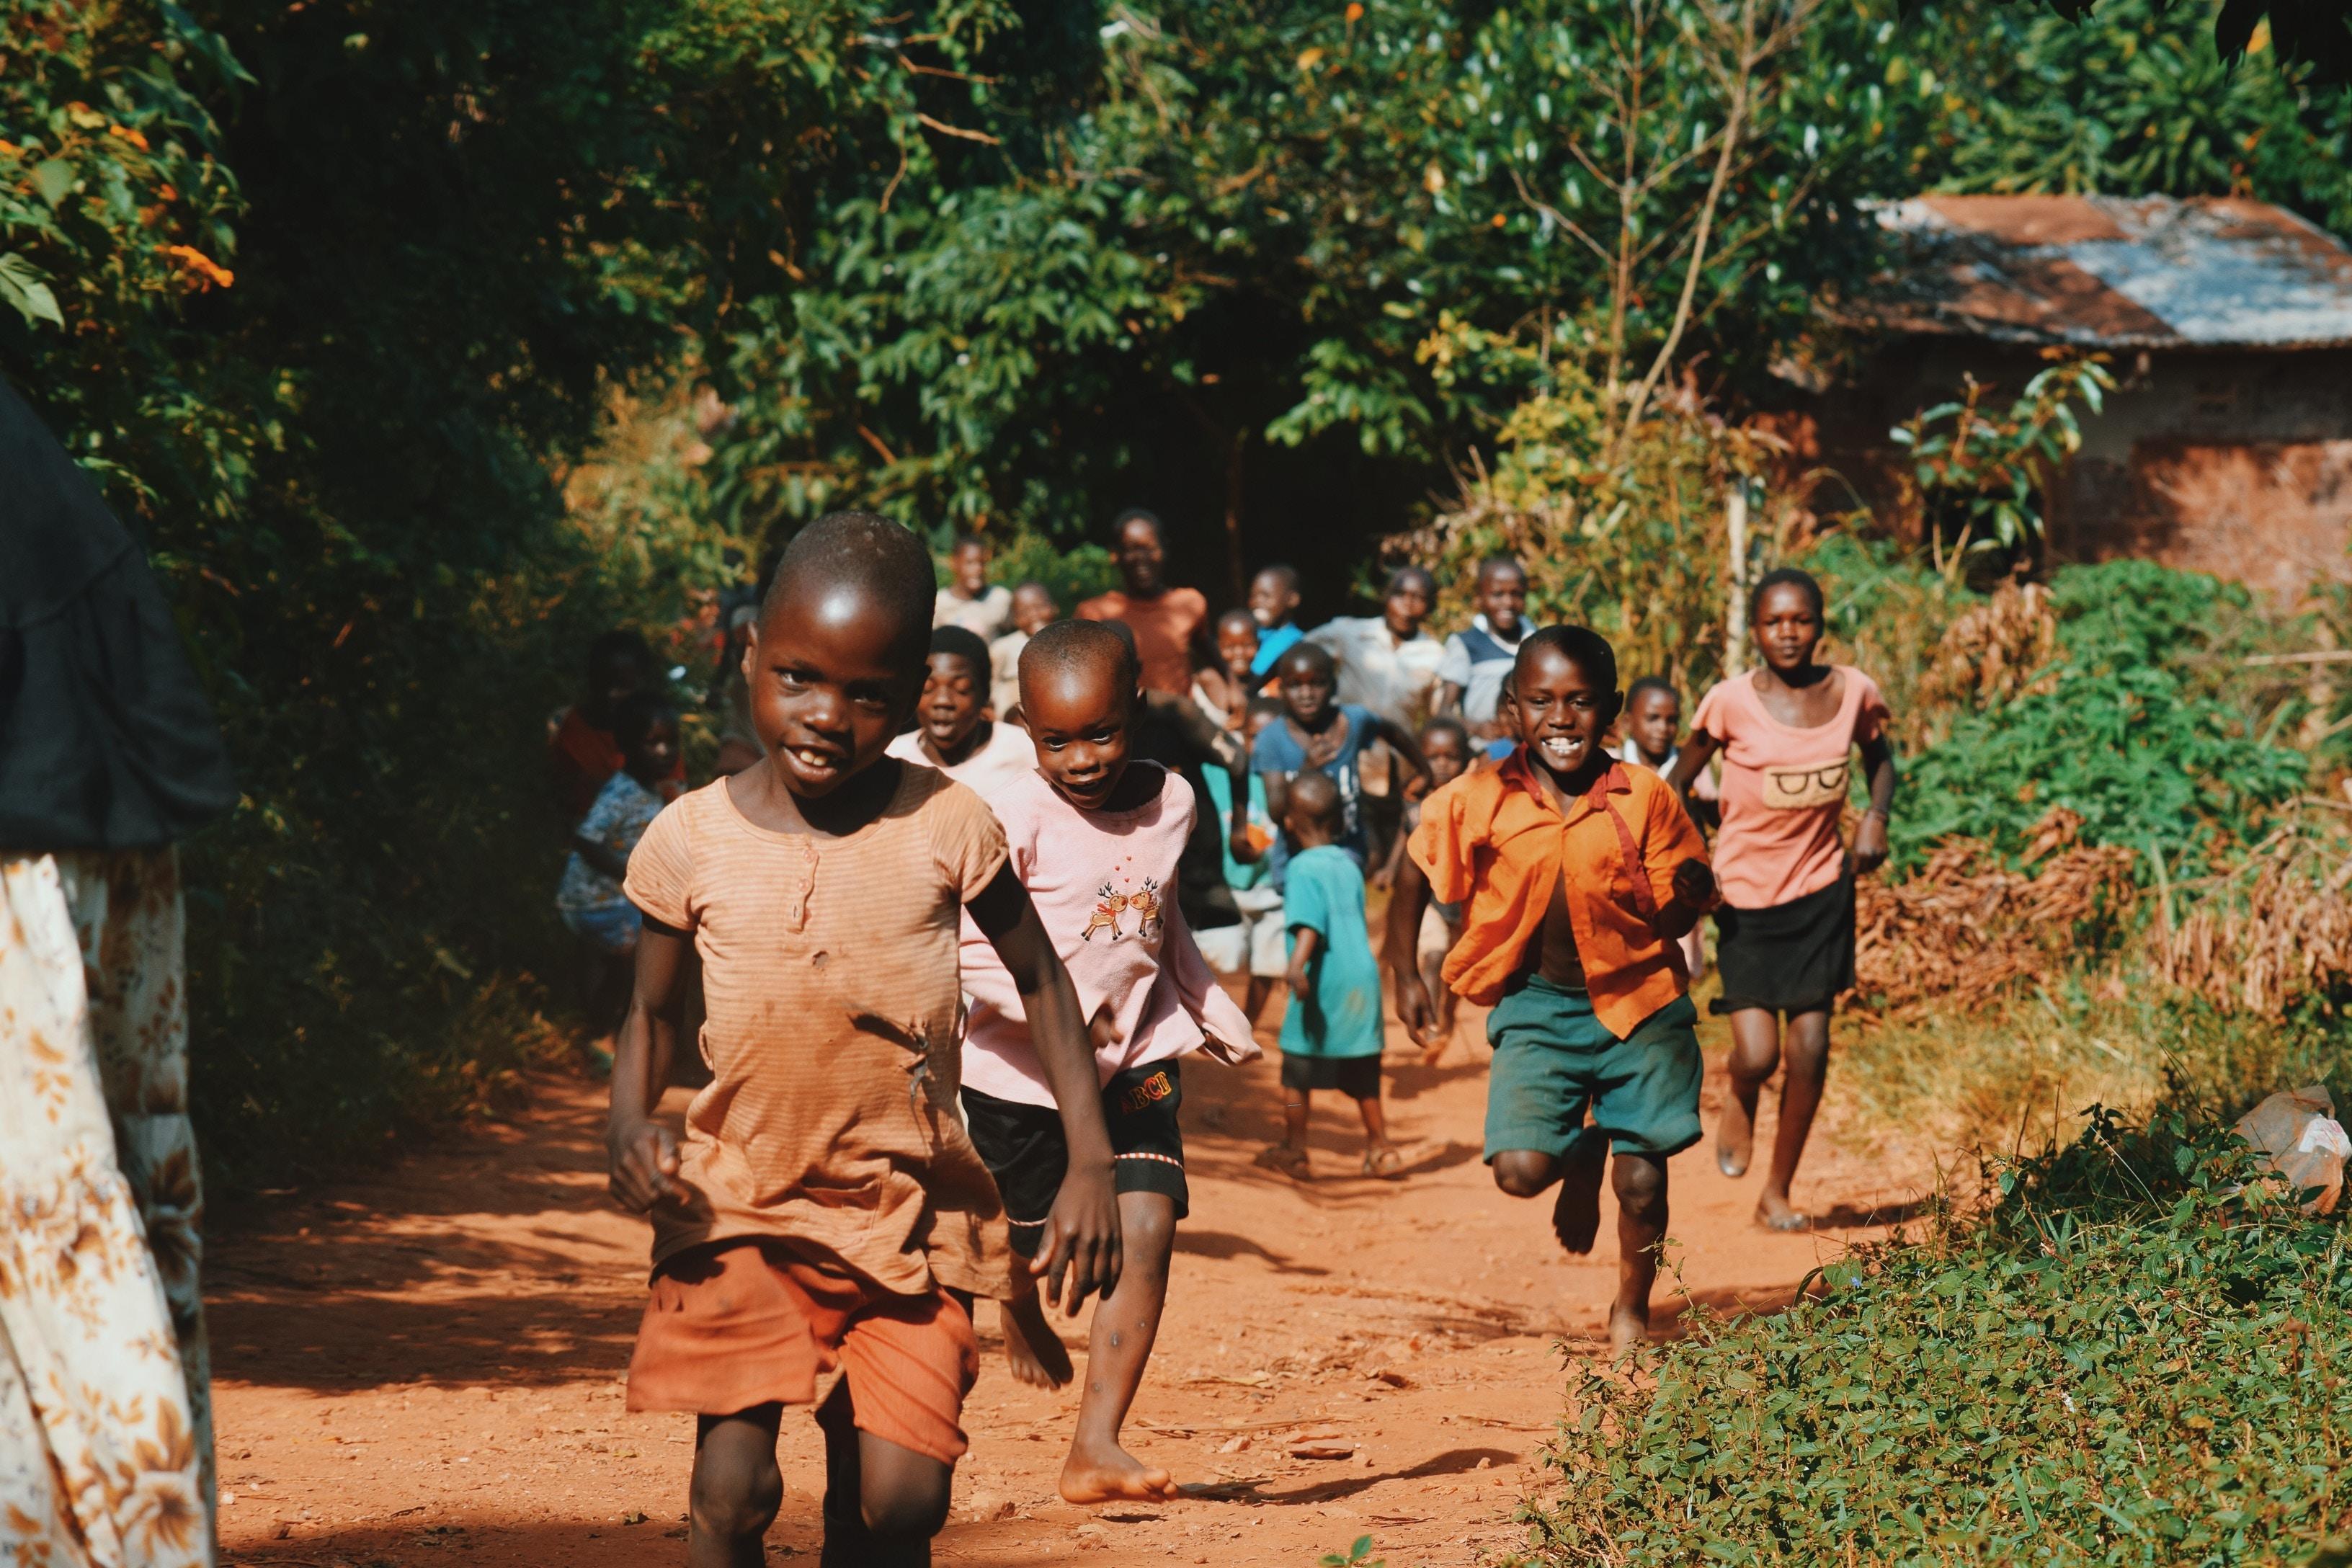 Open Schools Worldwide Kinds in Africa